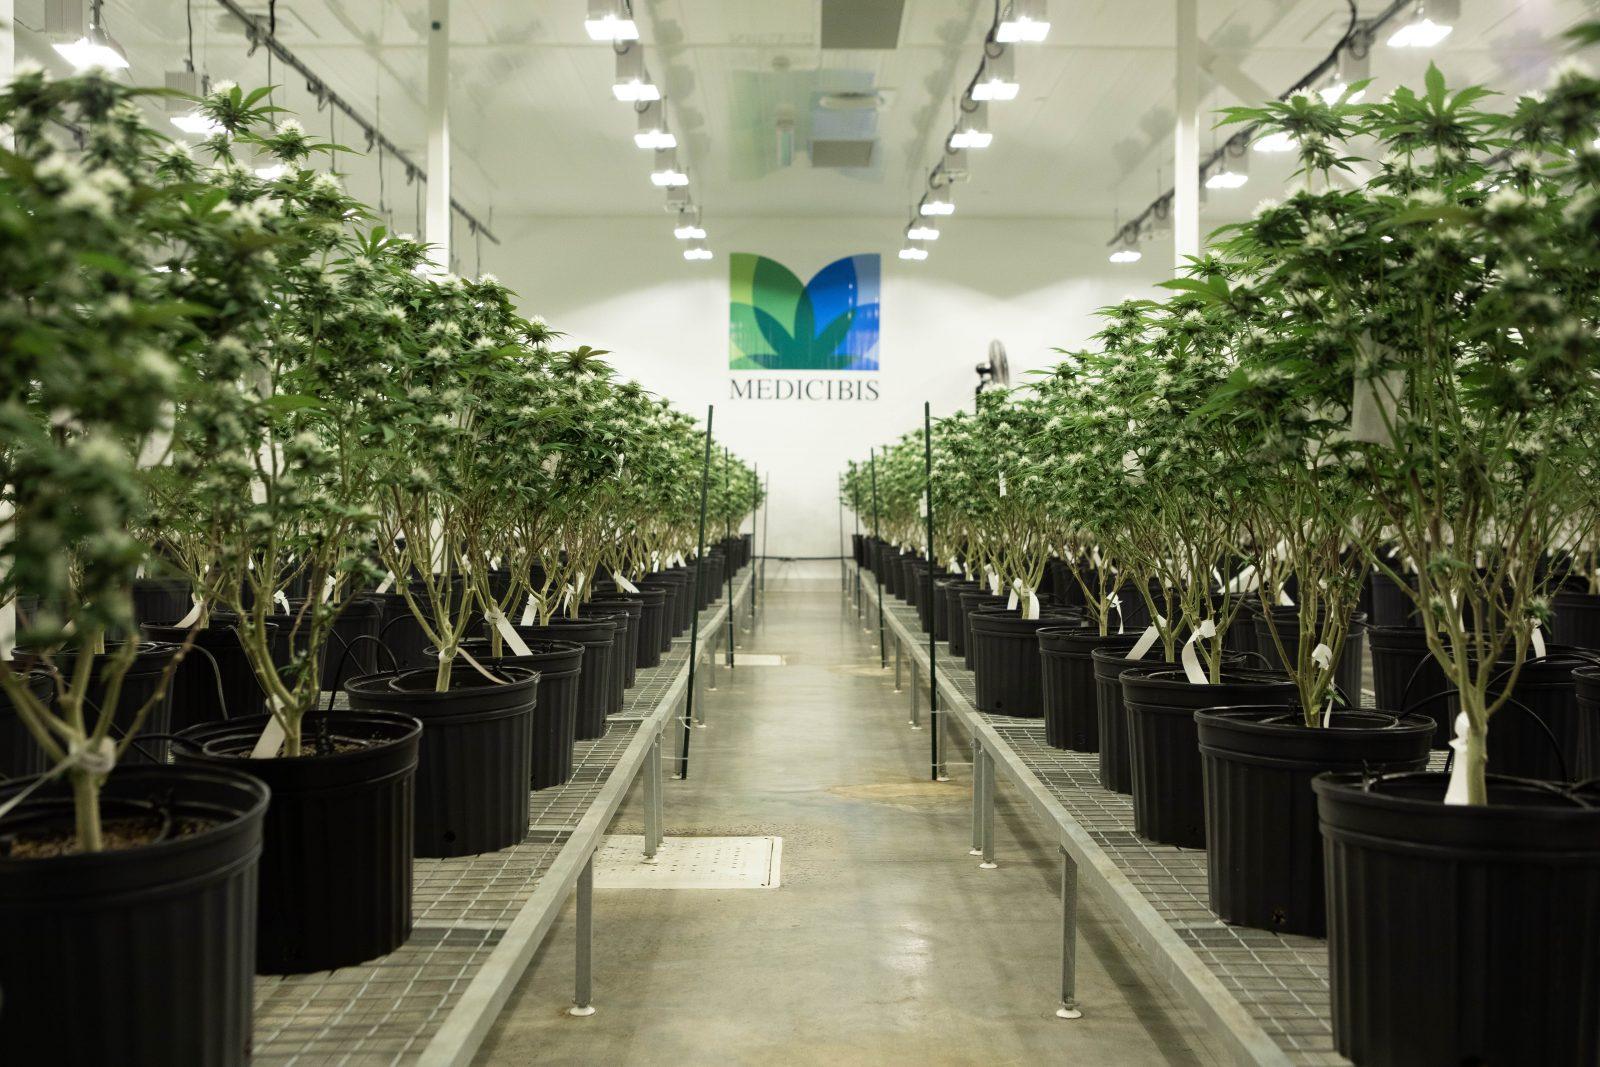 Incursion dans les serres de cannabis de Médicibis